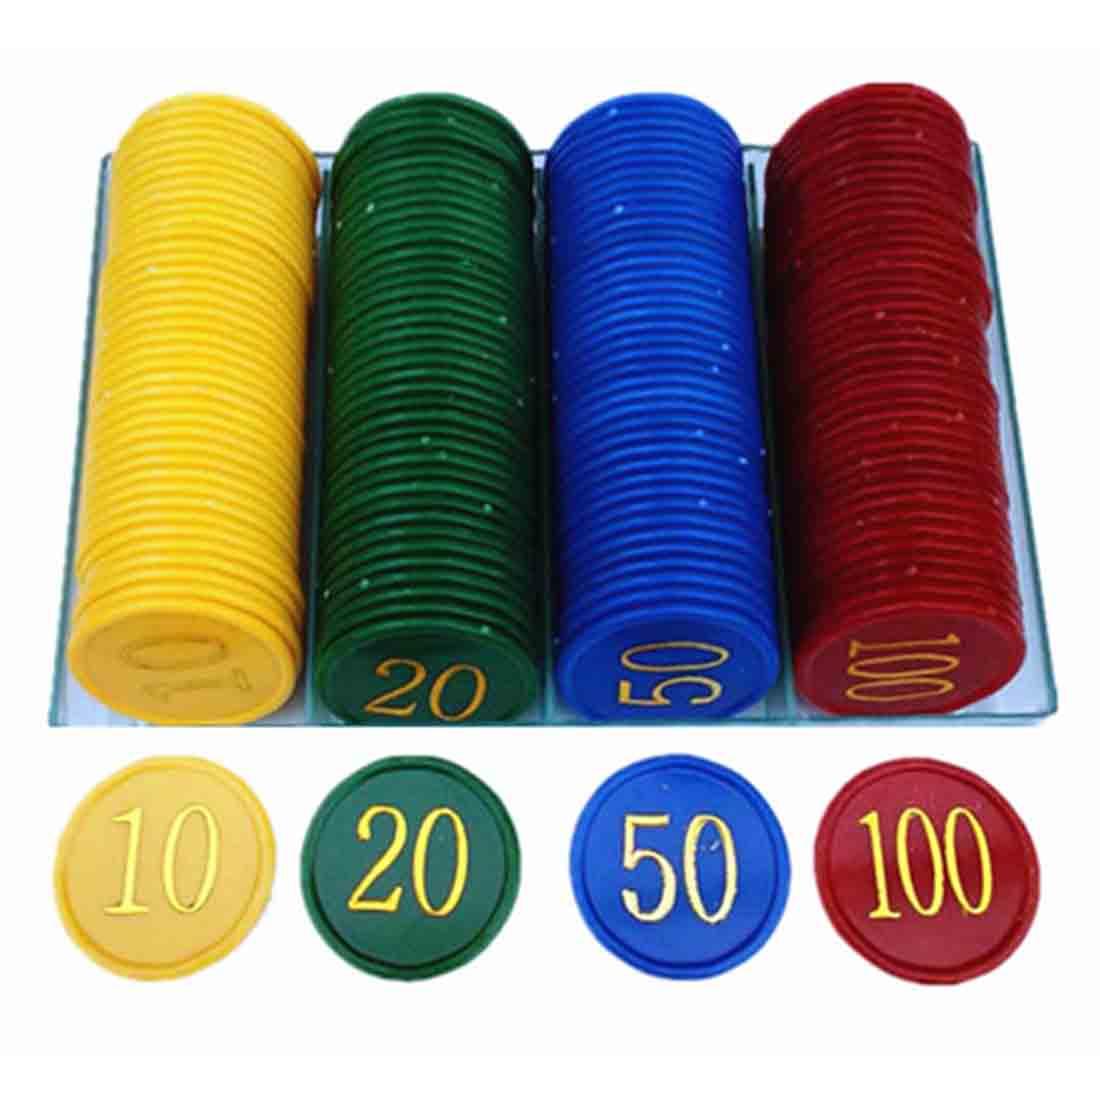 Font poker chips